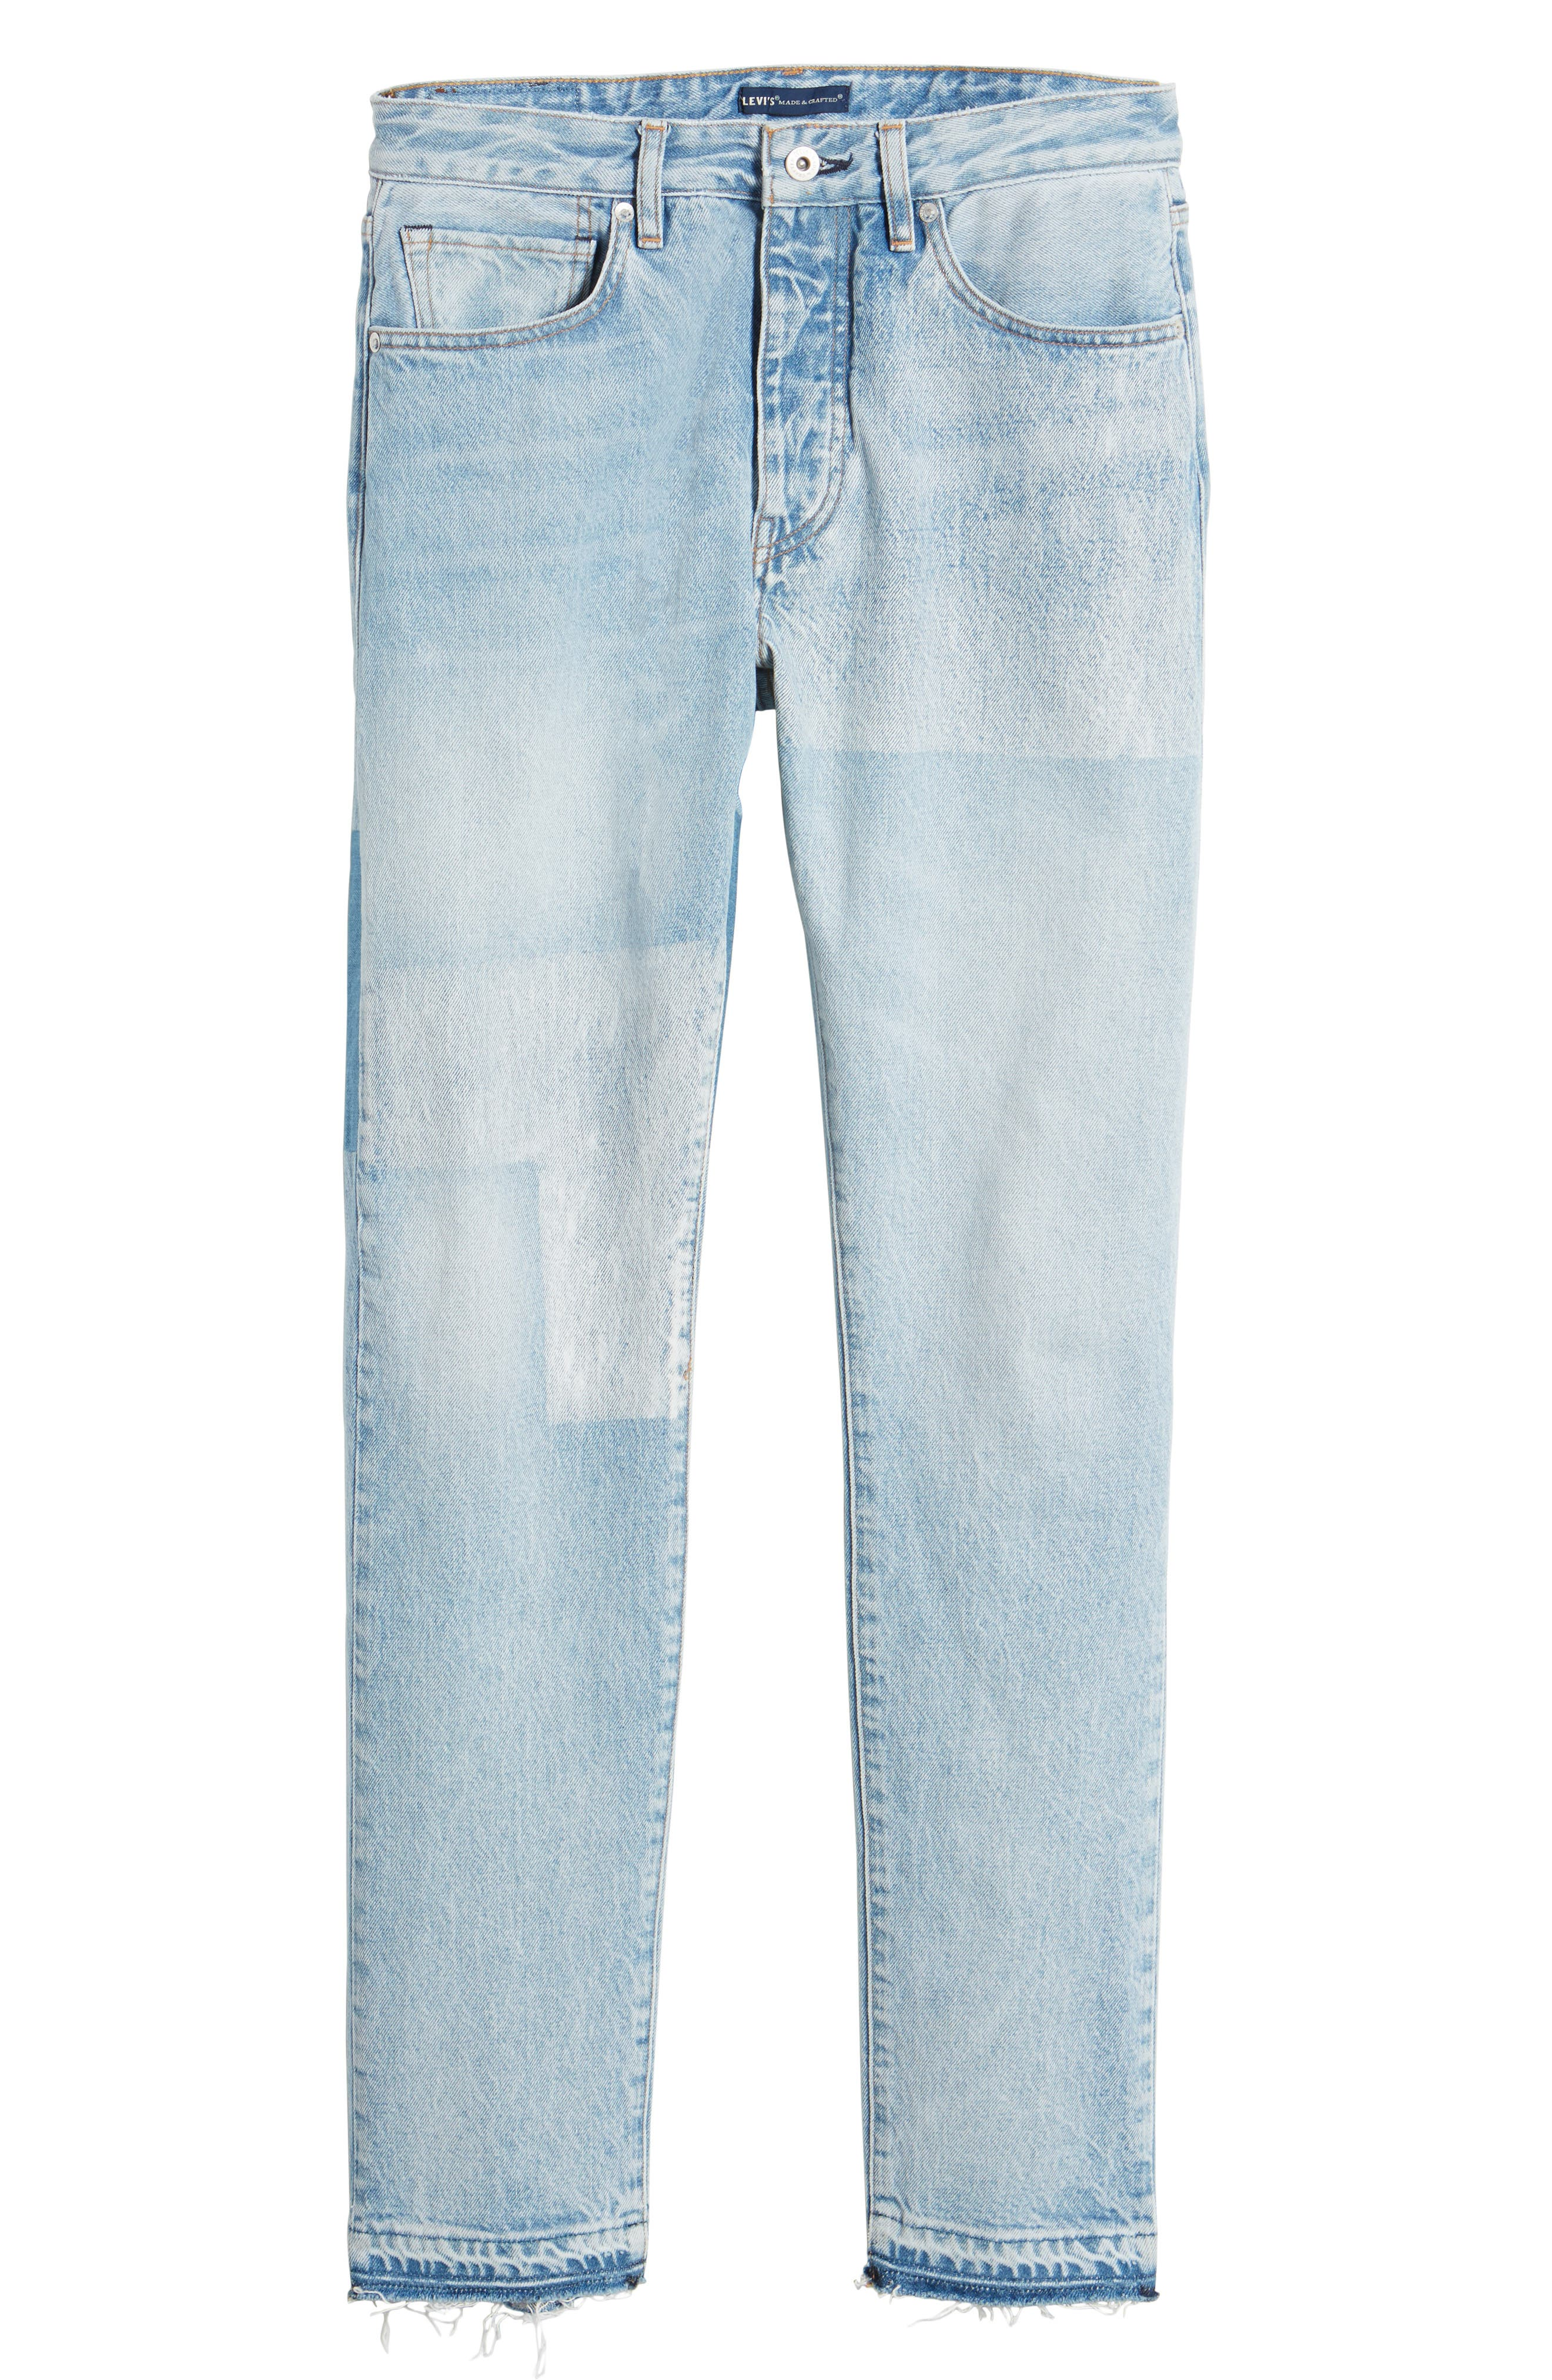 Studio Slim Fit Jeans,                             Alternate thumbnail 6, color,